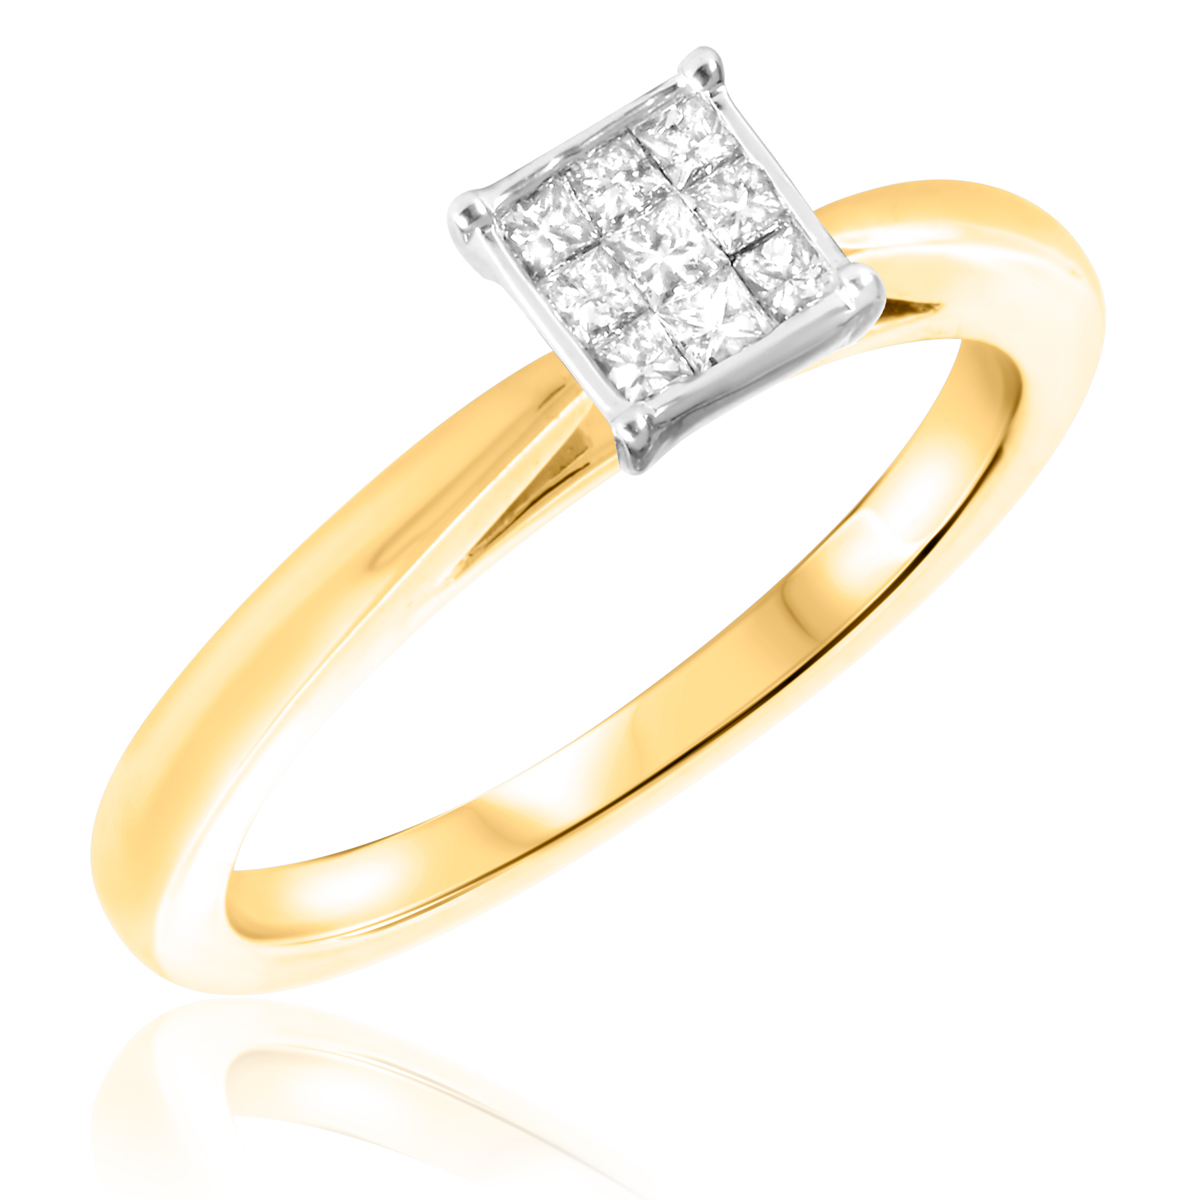 1/3 CT. T.W. Diamond Ladies Engagement Ring 10K Yellow Gold- Size 8